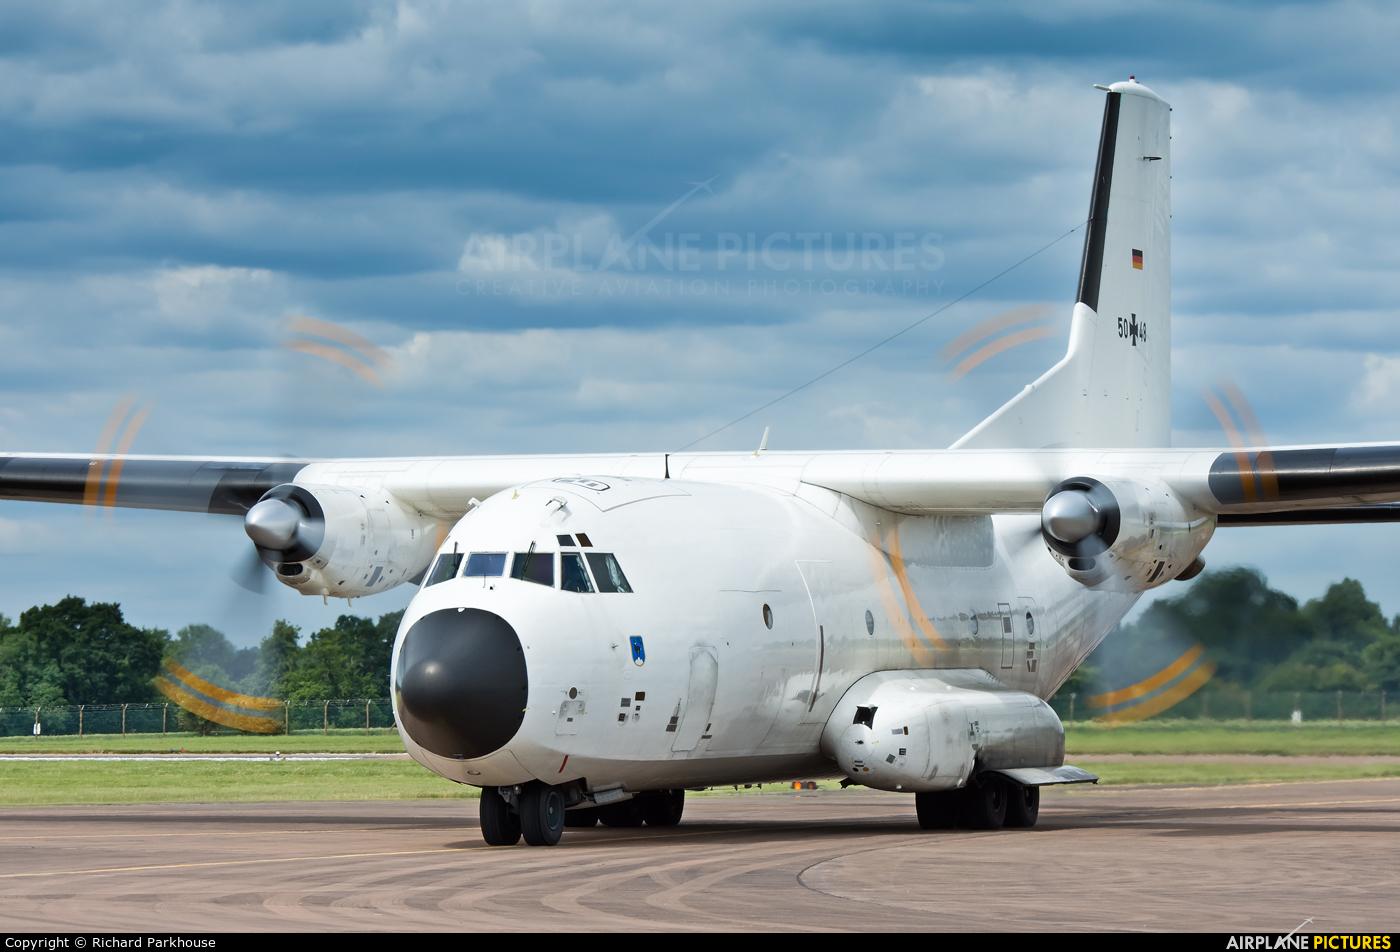 Germany - Air Force 50+48 aircraft at Fairford